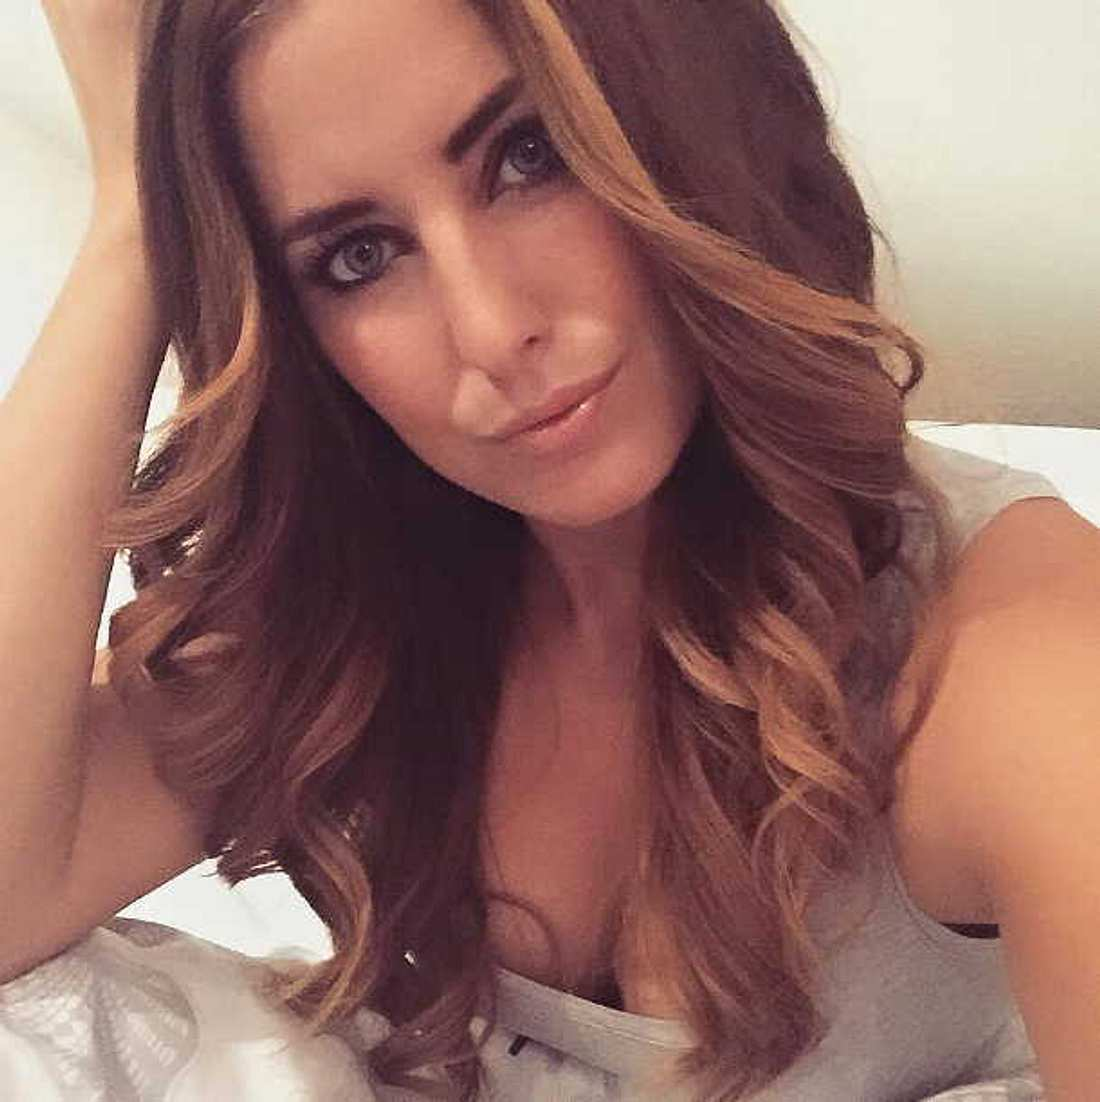 Bachelor-Zweitplatzierte Ramona Stöckli ist wieder Single!